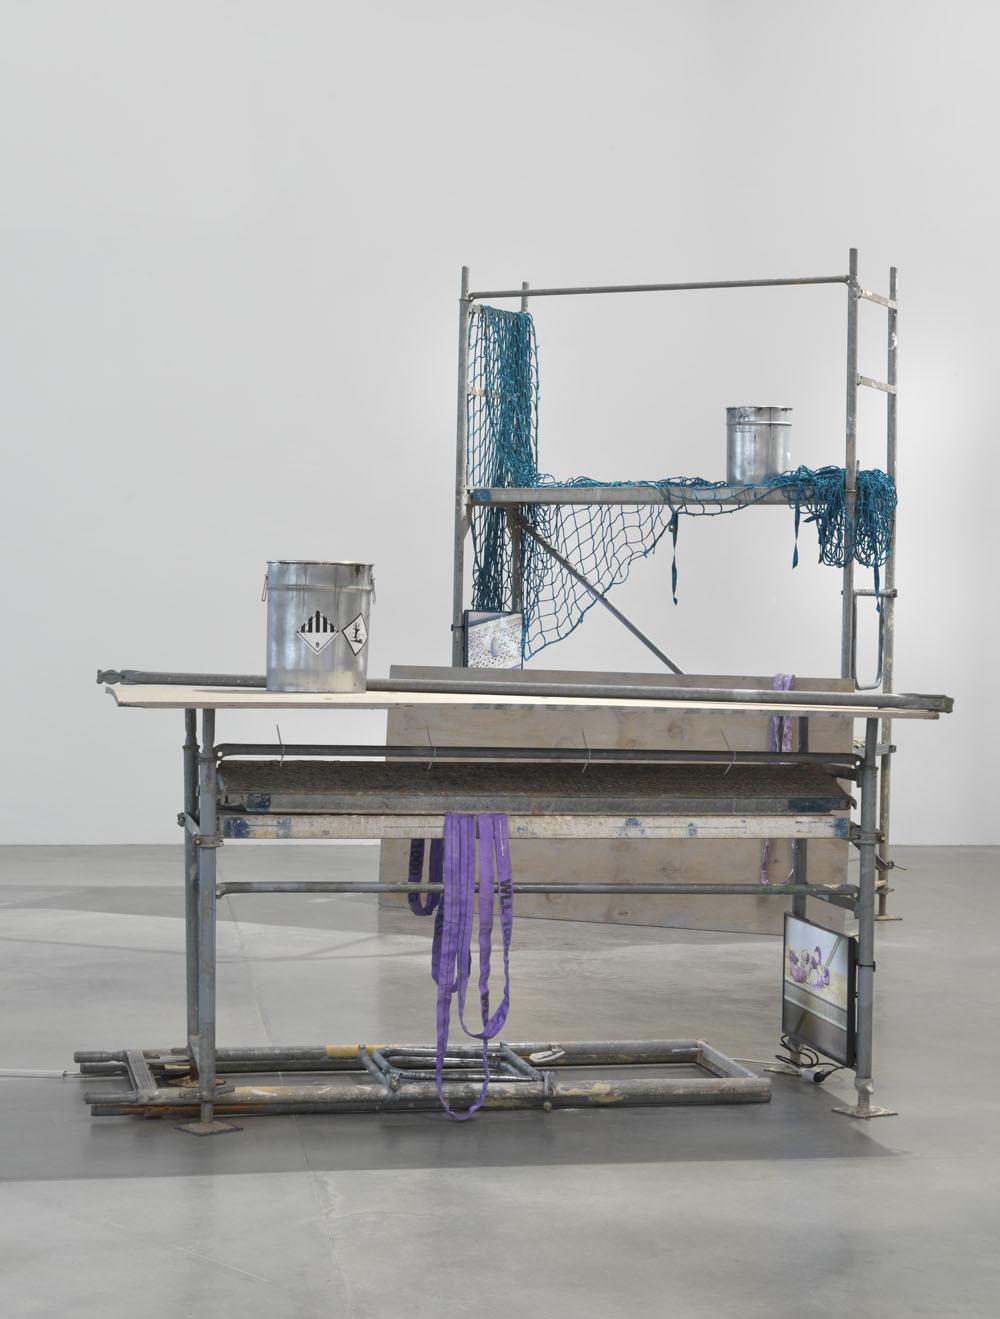 Sofia Hultén:  Unstable Fakers of Change in Self , Exhibition view KINDL – Centre for Contemporary Art; © Sofia Hultén VG BILD-KUNST, Bonn, 2018; Photo: Jens Ziehe, 2018